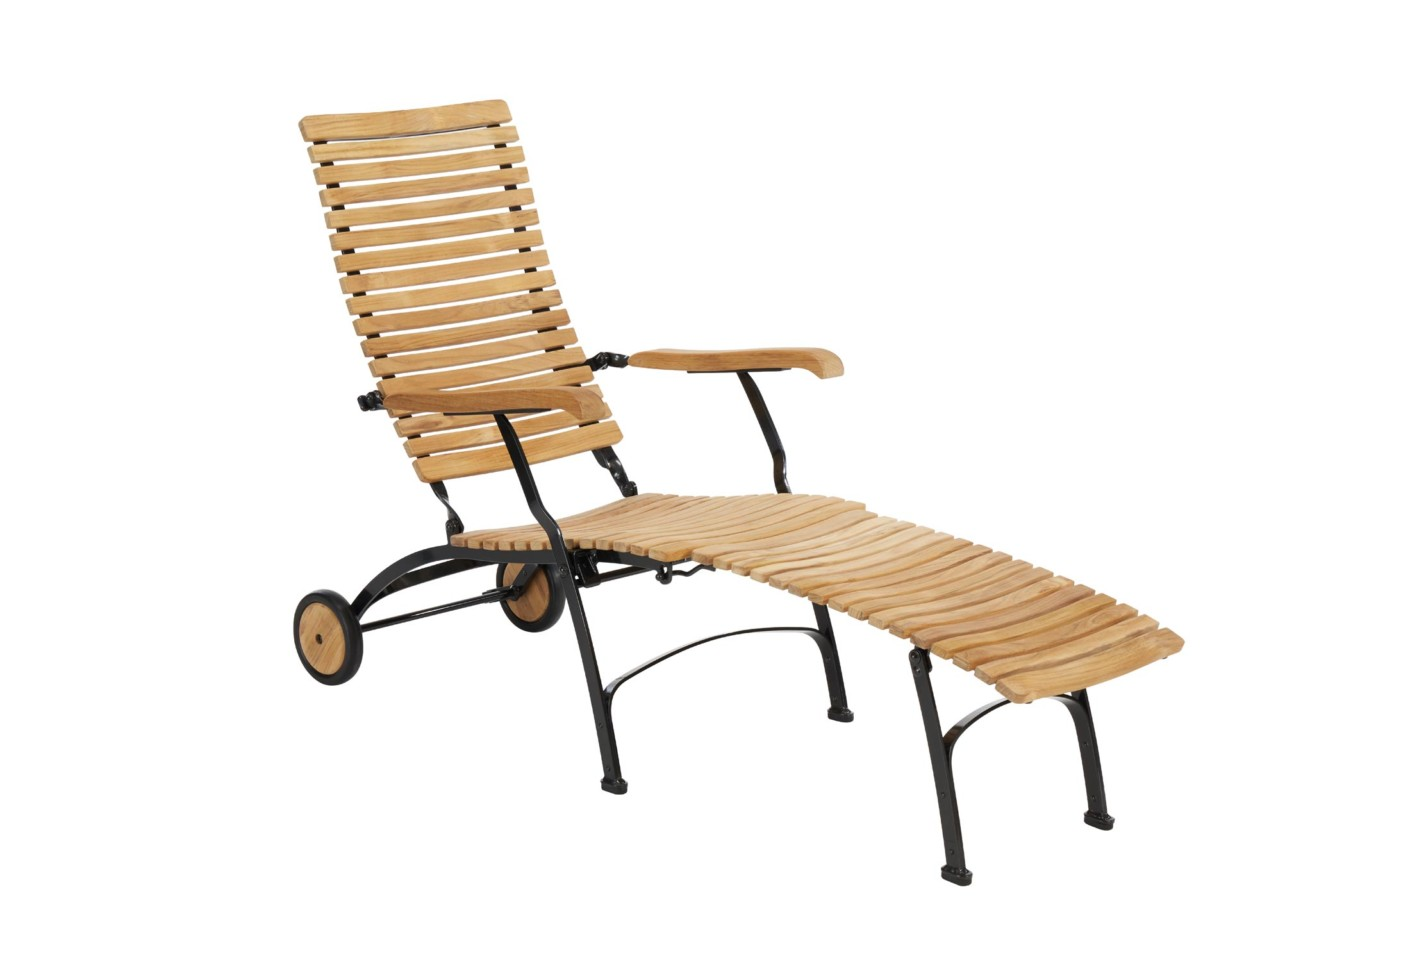 deckchair edelstahl perfect dedon hocker mbrace mit kissen with deckchair edelstahl great. Black Bedroom Furniture Sets. Home Design Ideas